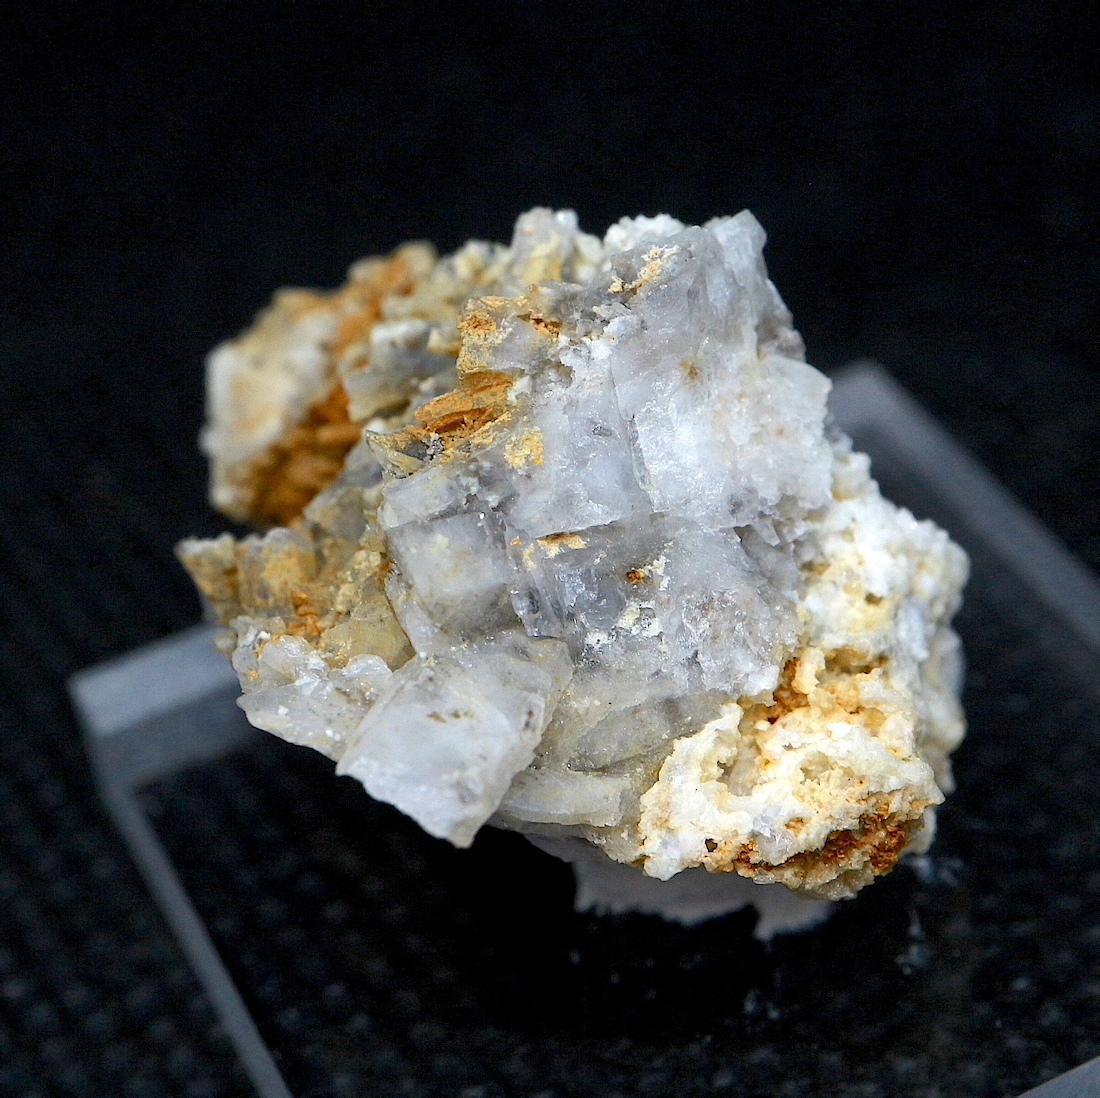 USA産 フェナカイト ベリル カルサイト 原石  6,3g IRI021 鉱物 天然石 パワーストーン